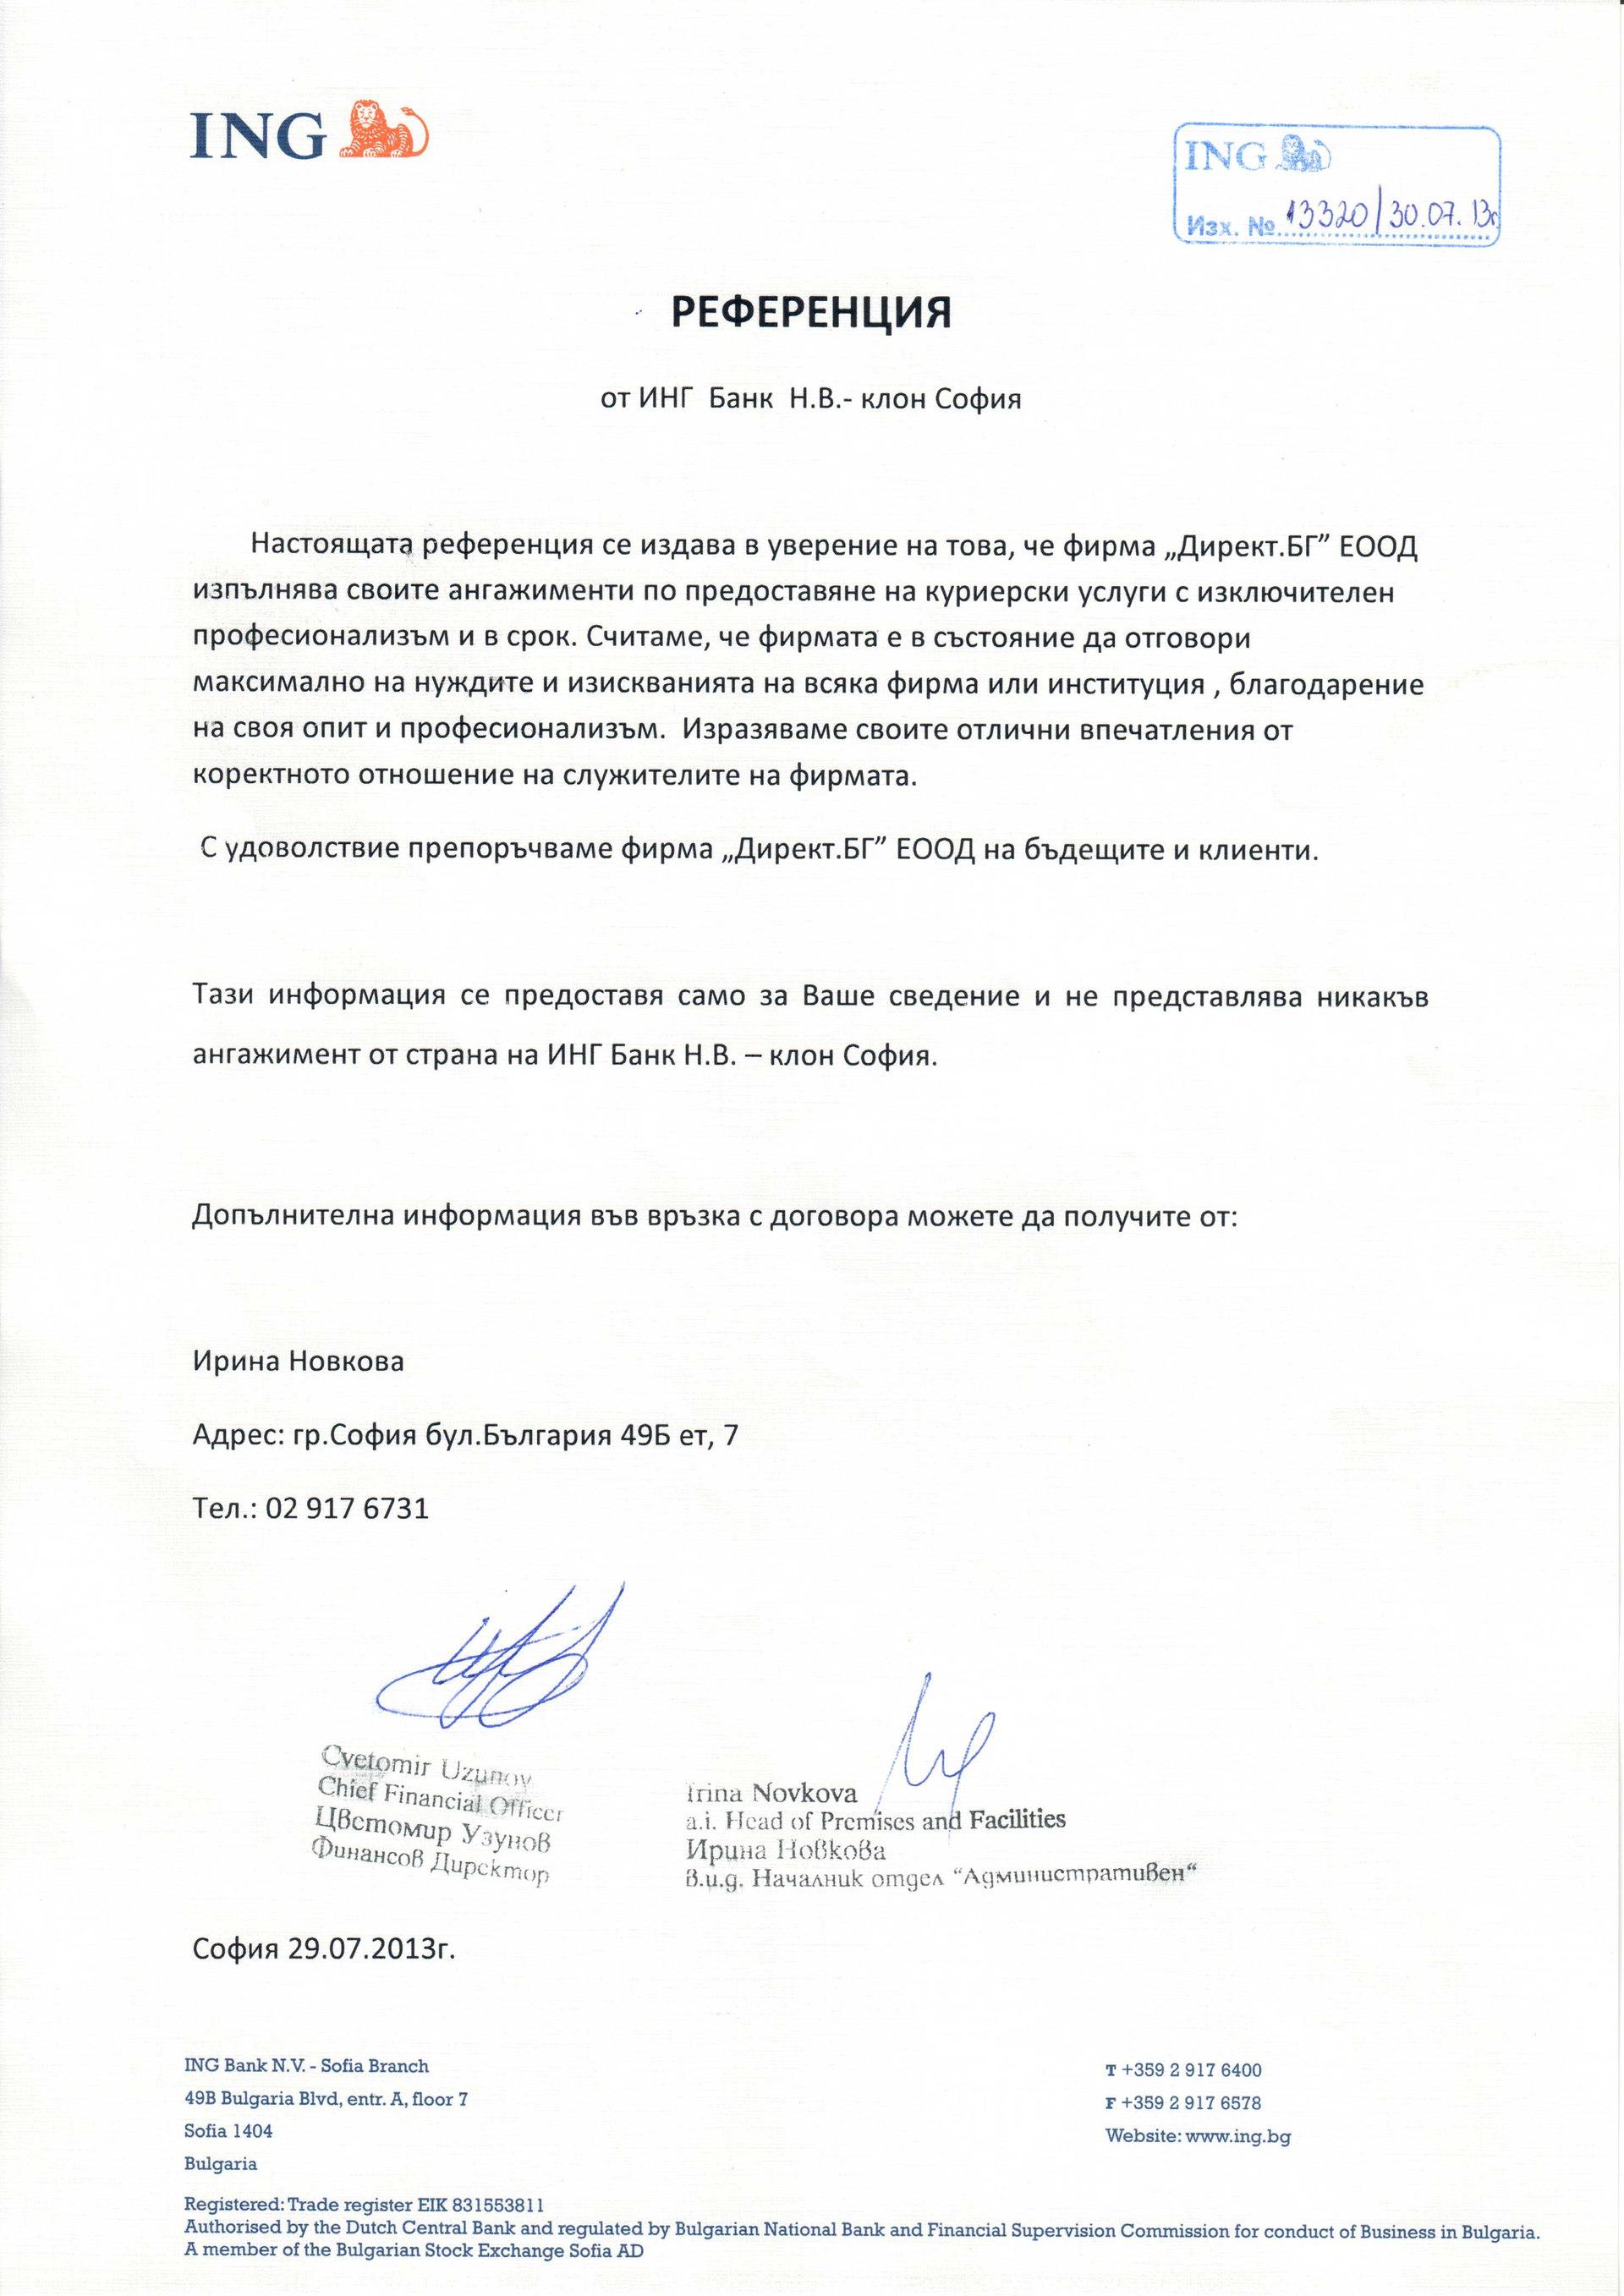 Референция от ИНГ Банк Н.Б.- клон София